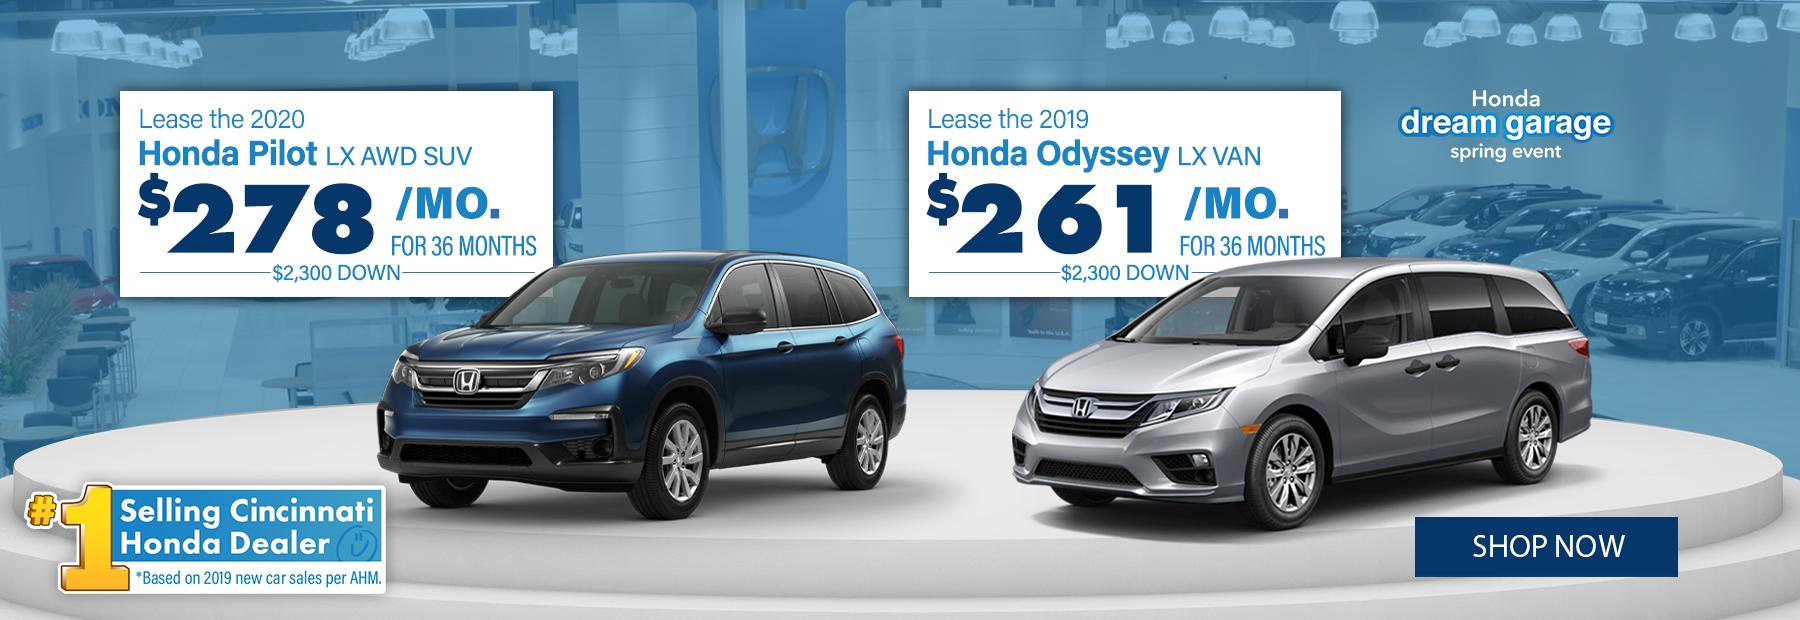 New 2020 Honda Pilot and Honda Odyssey Lease Deals in Cincinnati, OH